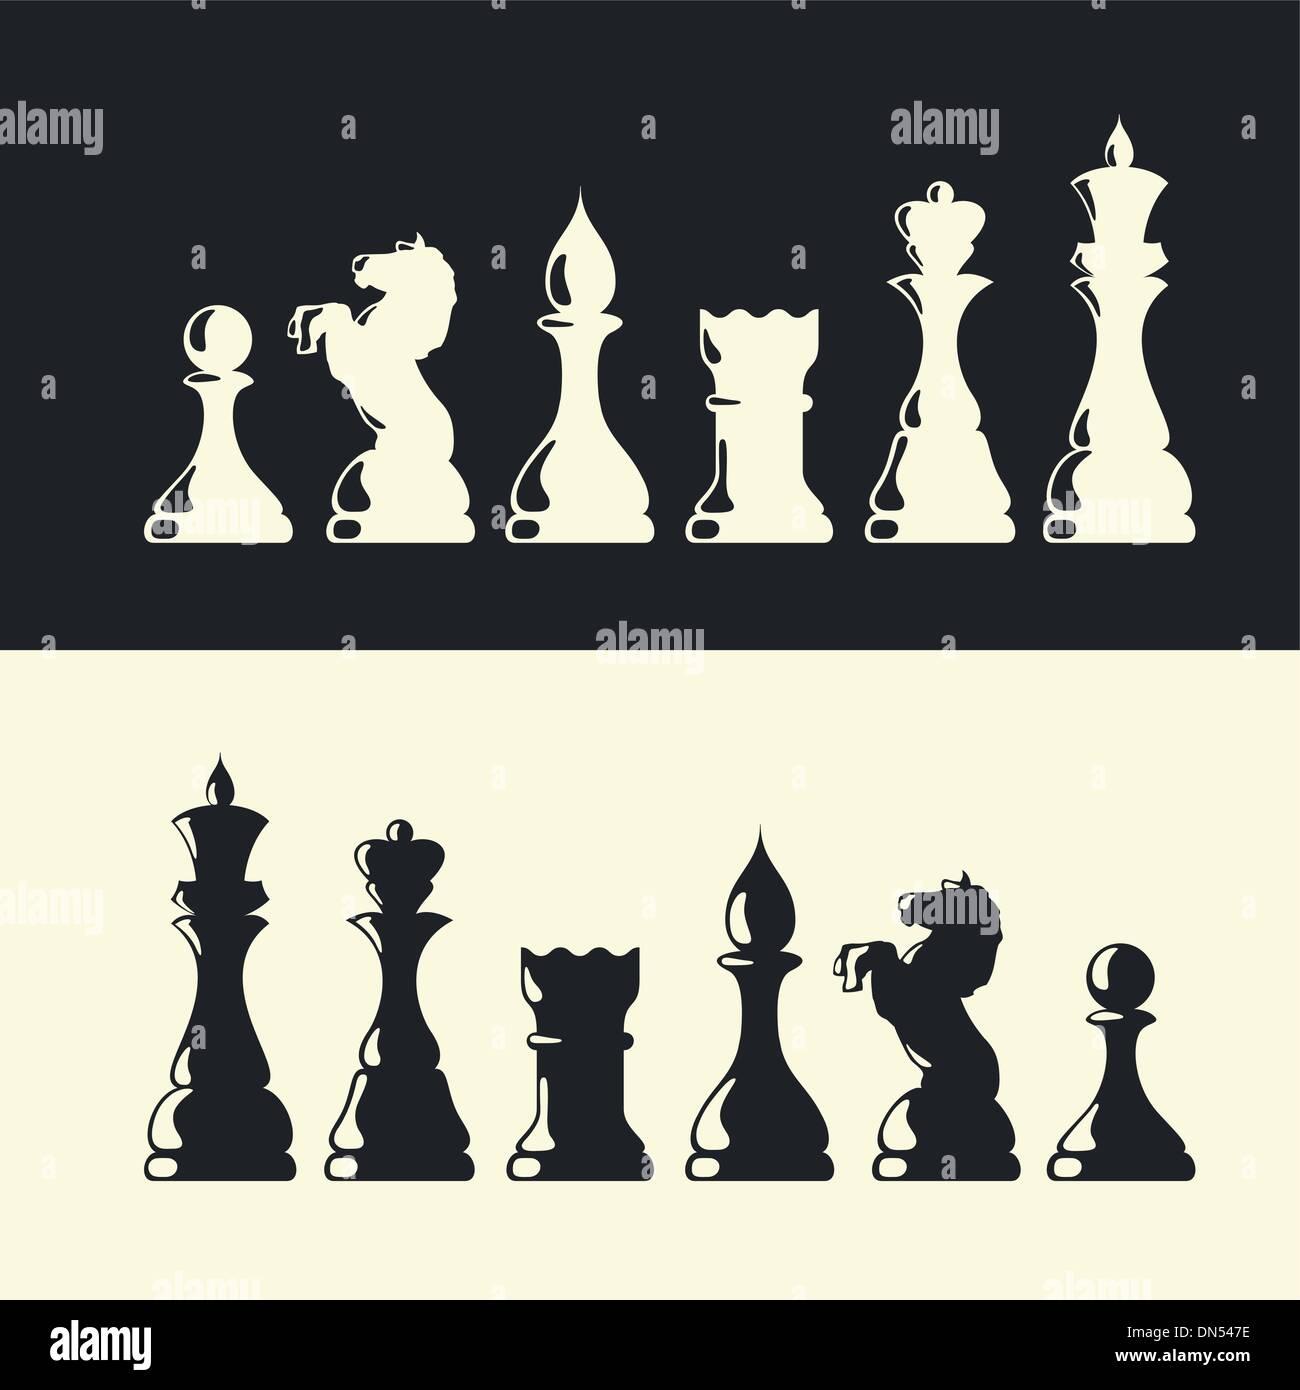 Schach-Stücke-Sammlung. Vektor Stock Vektor